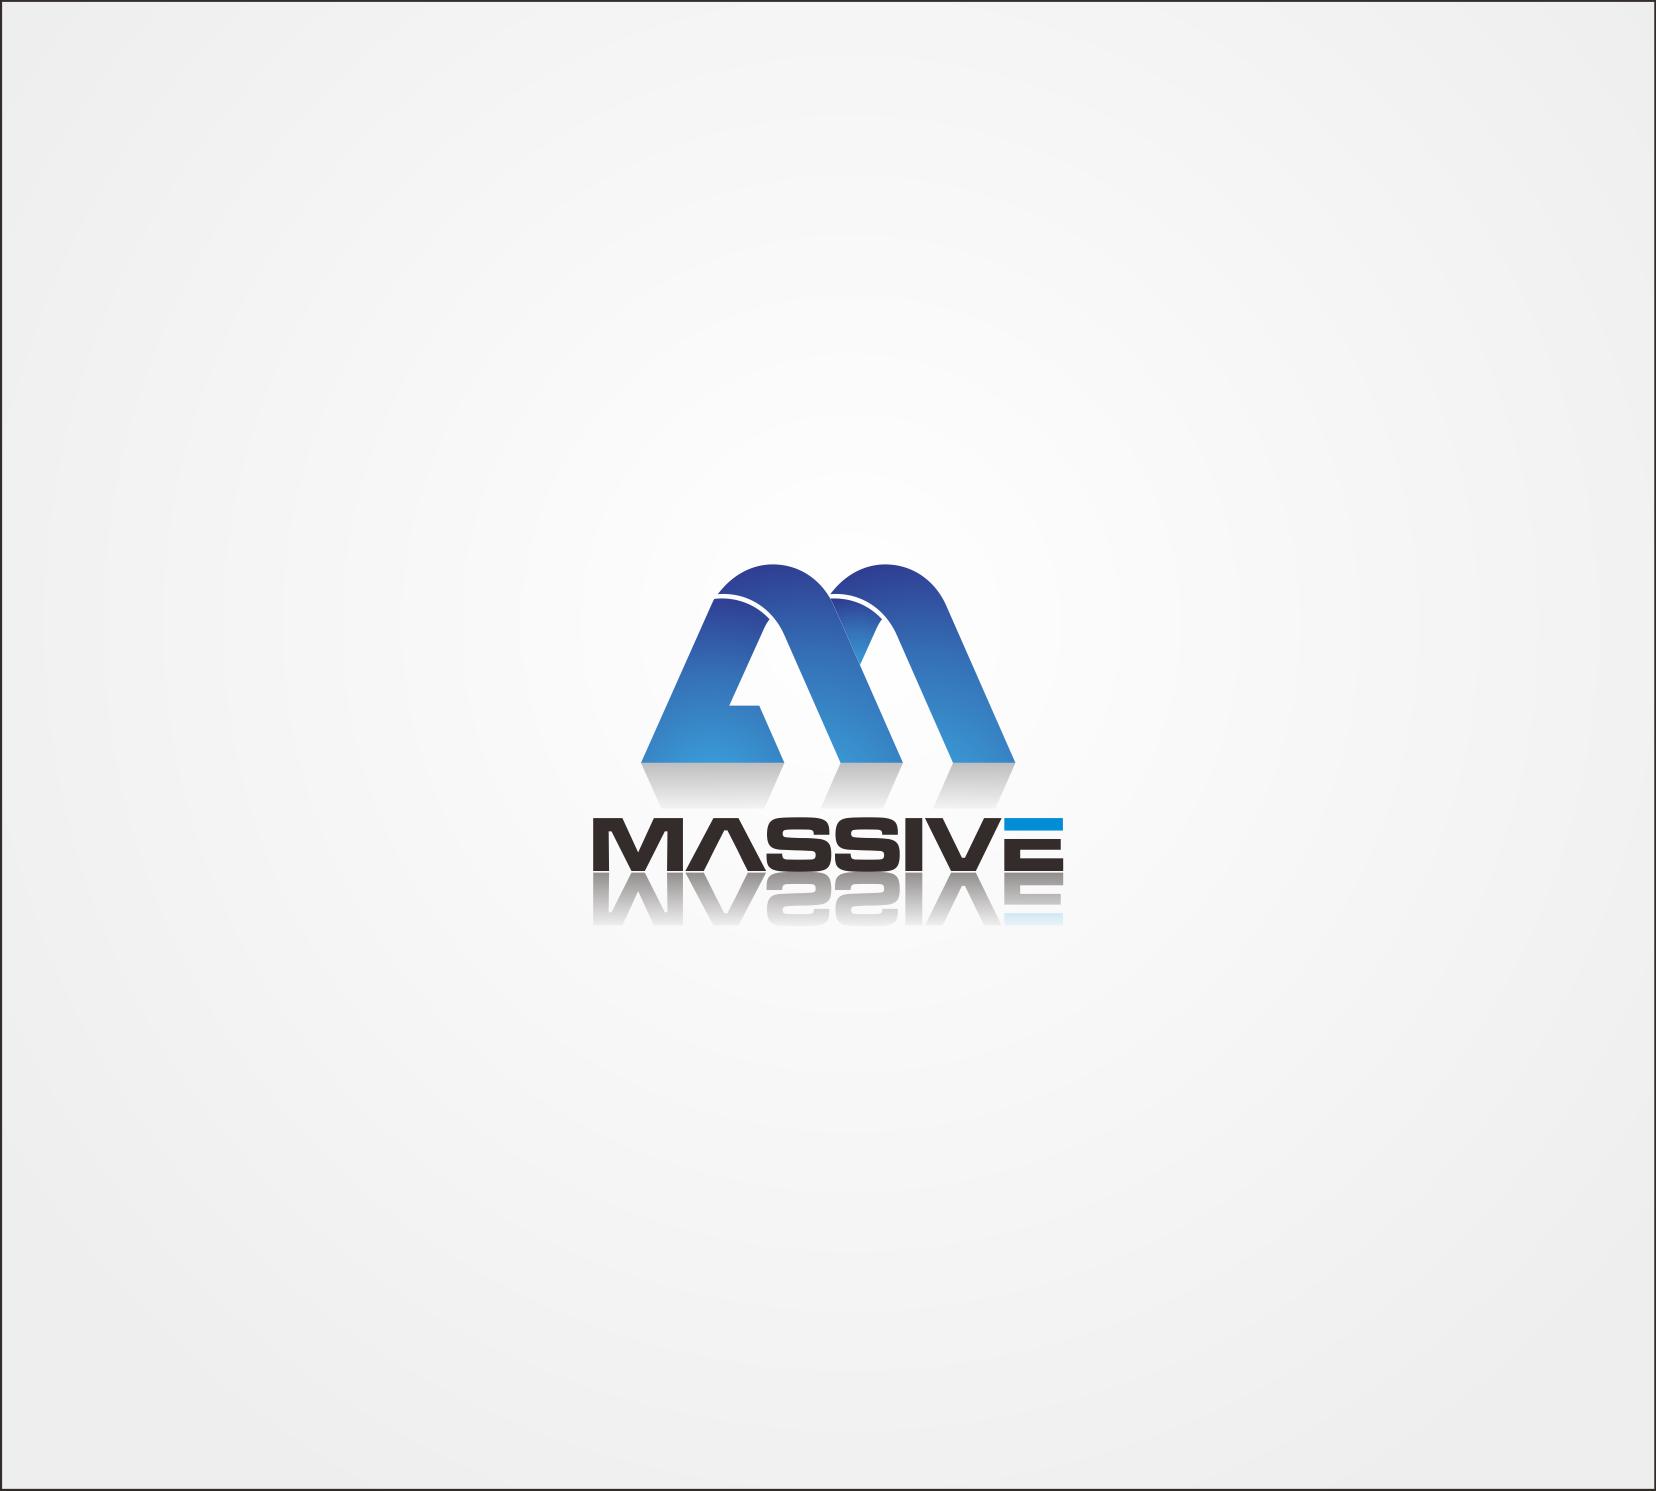 Logo Design by Red Zone - Entry No. 498 in the Logo Design Contest MASSIVE LOGO.